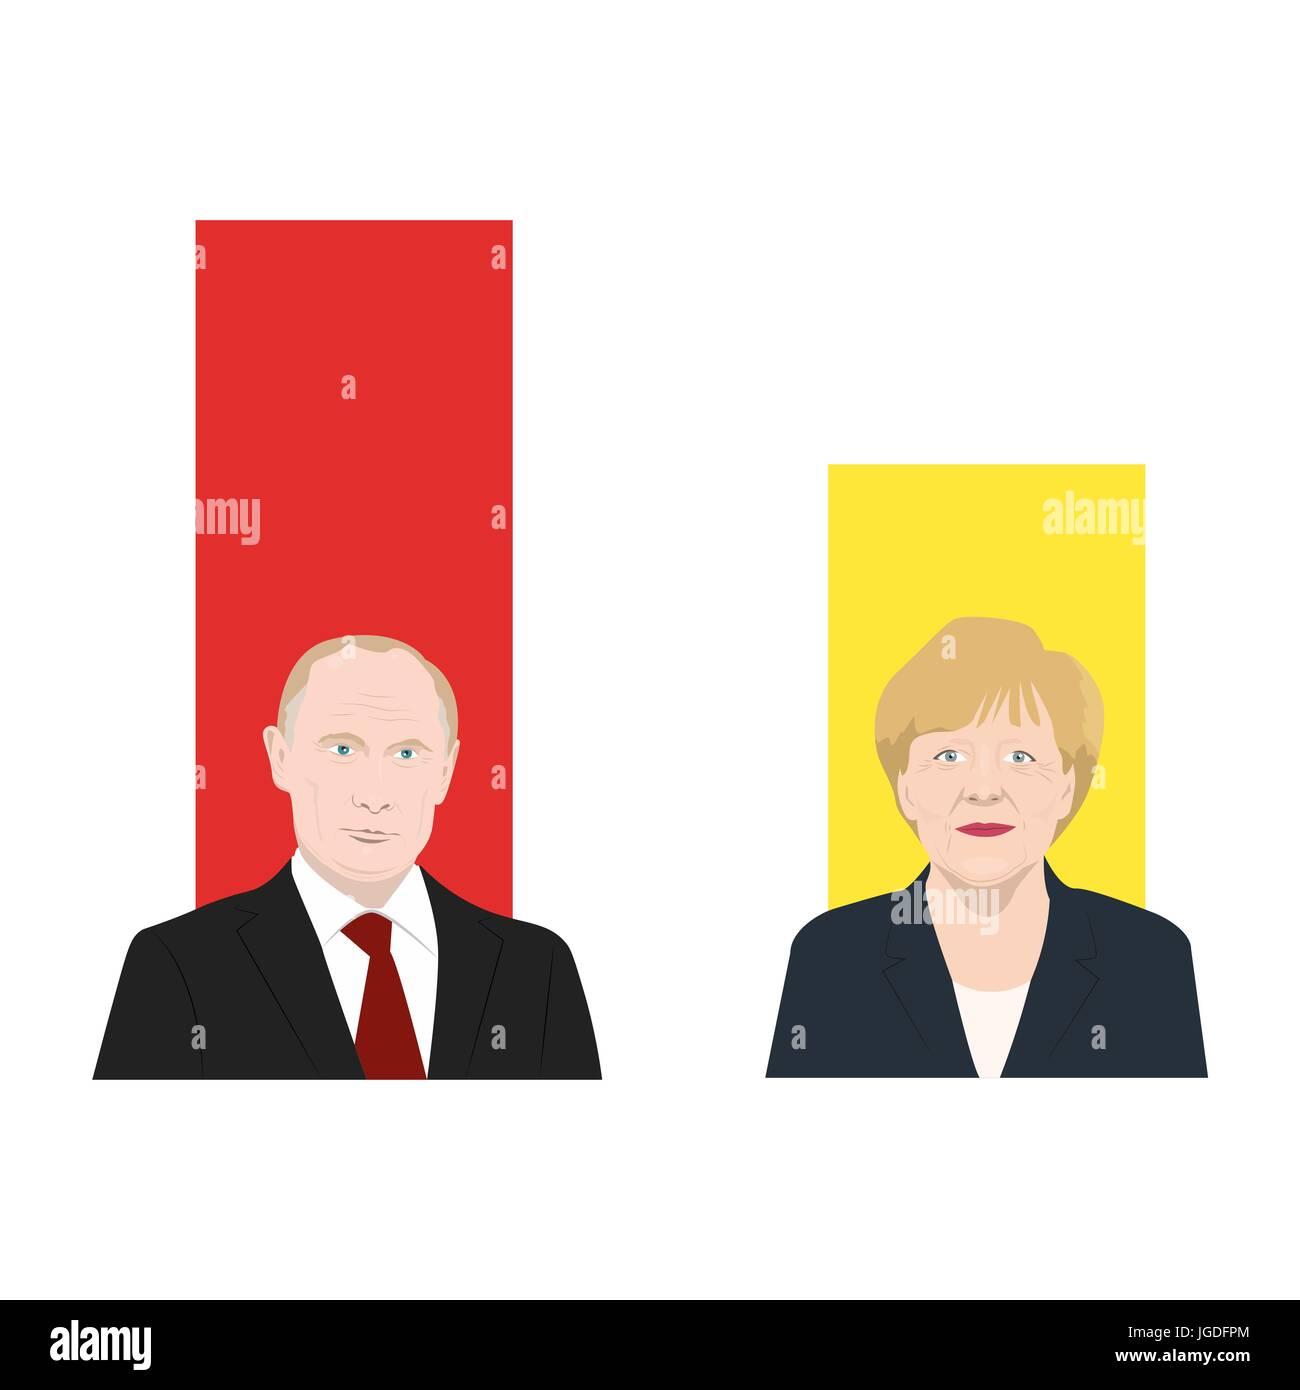 politicians - Stock Image